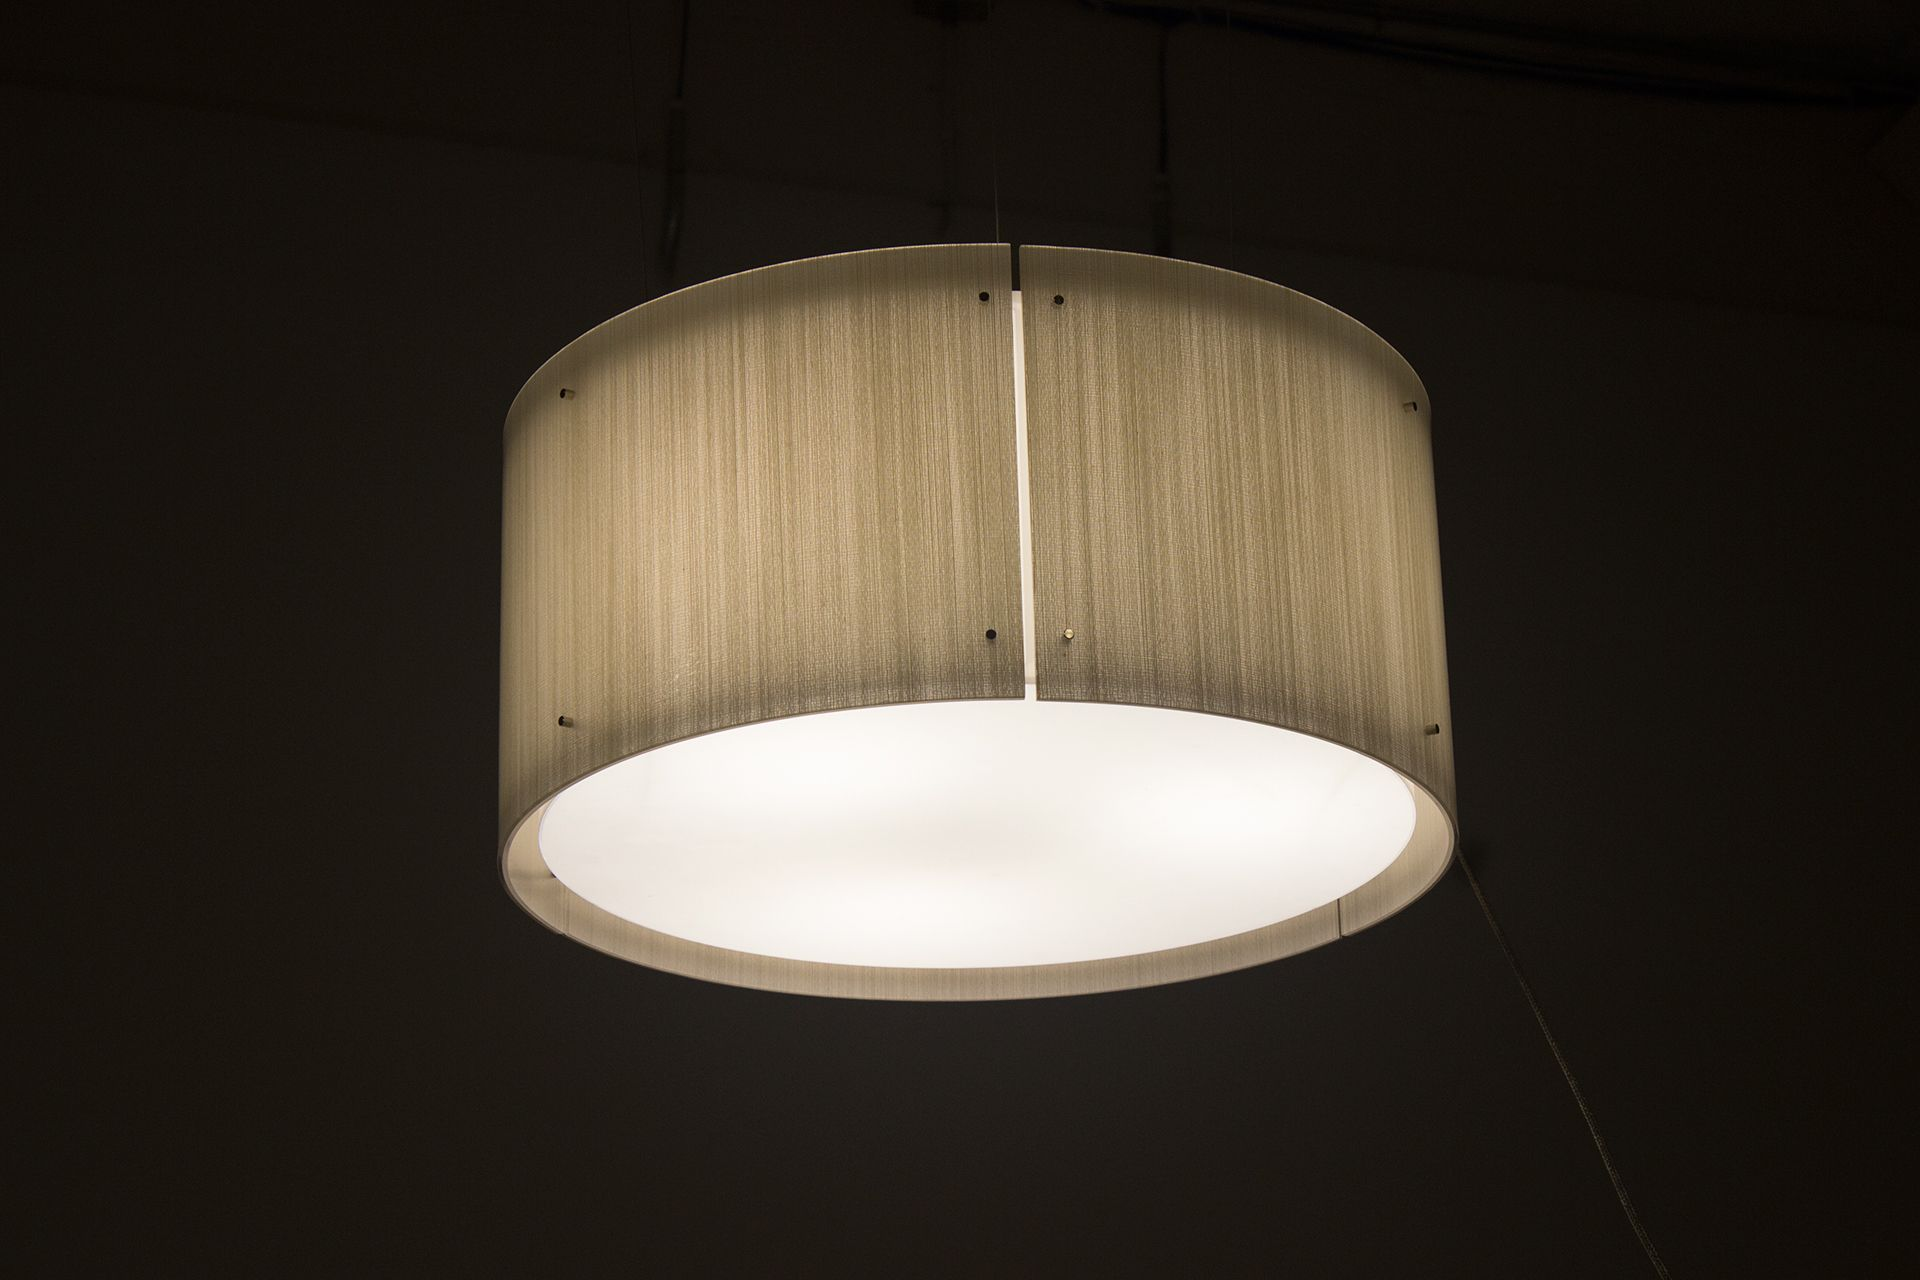 Drum style light fixture lightart custom lighting handmade in seattle made from 3form varia ecoresin